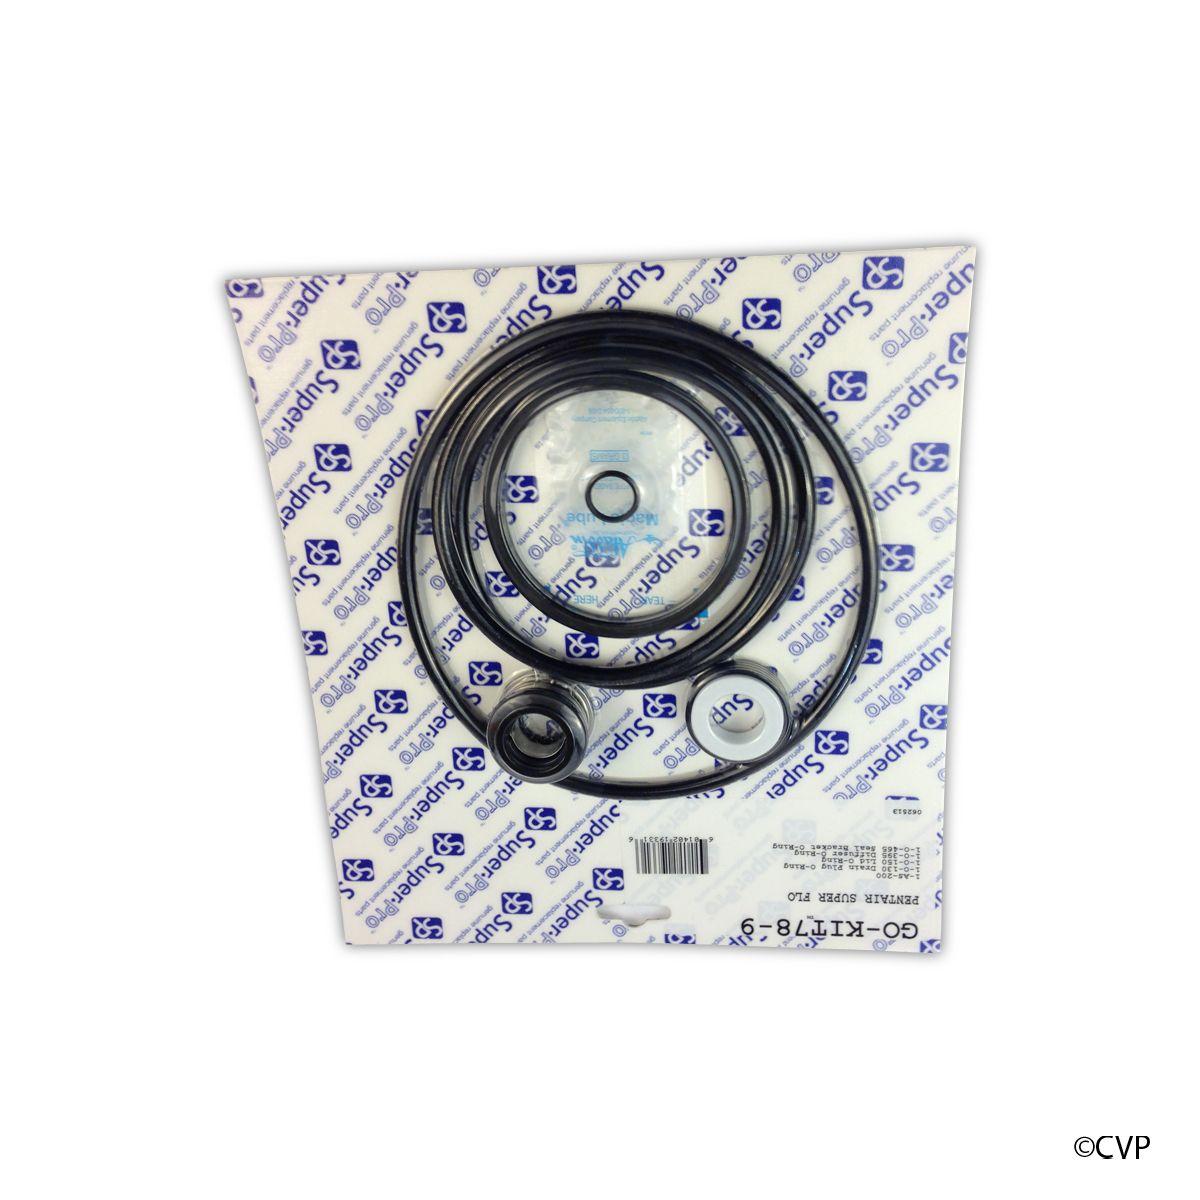 Pentair Superflo Pump Seal Go Kit78 9 All Pool Filters 4